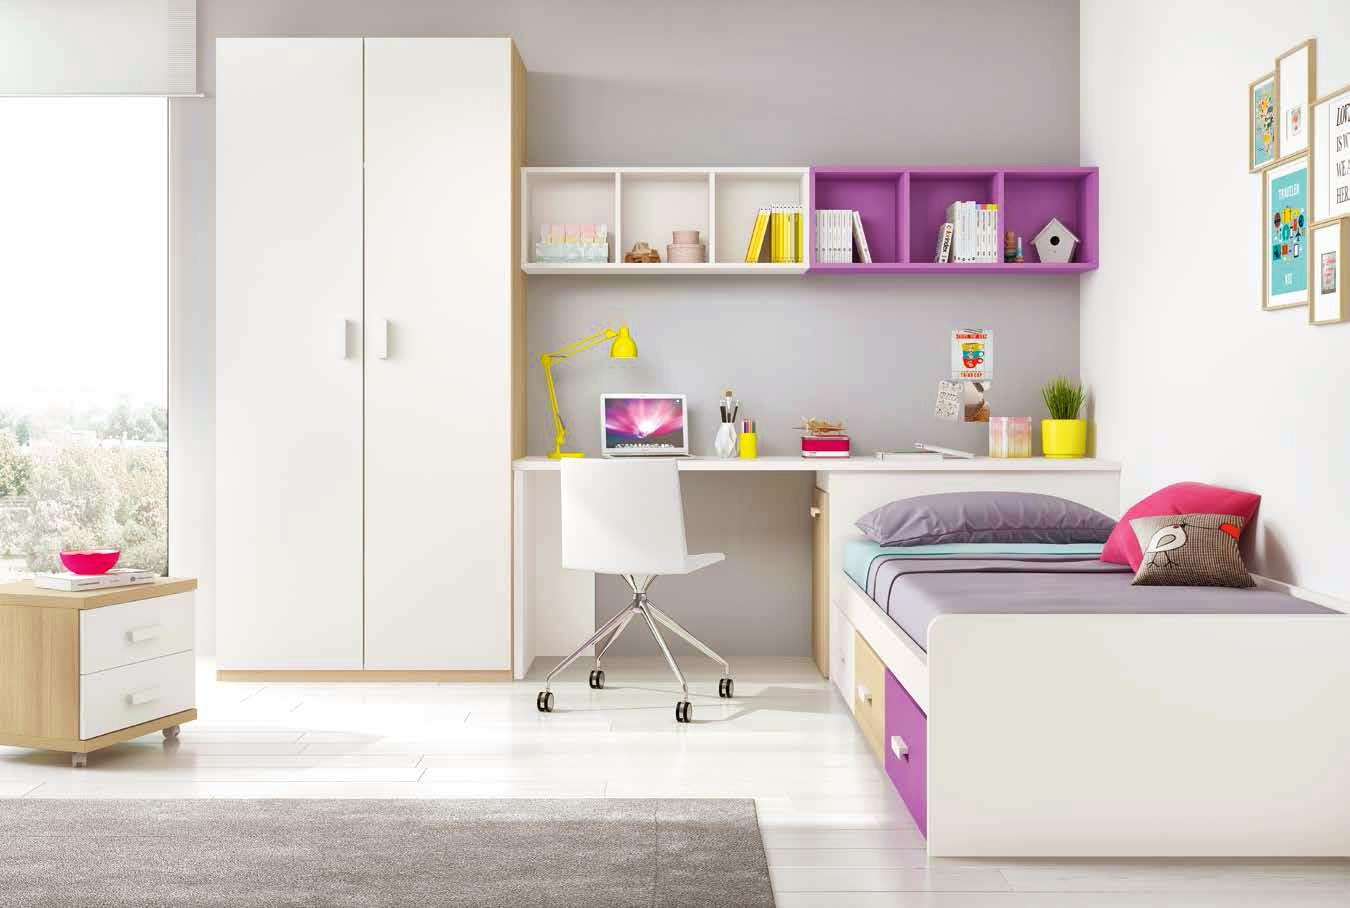 Chambre ado design multicolore avec lit 3 coffres for Habitaciones juveniles pintadas